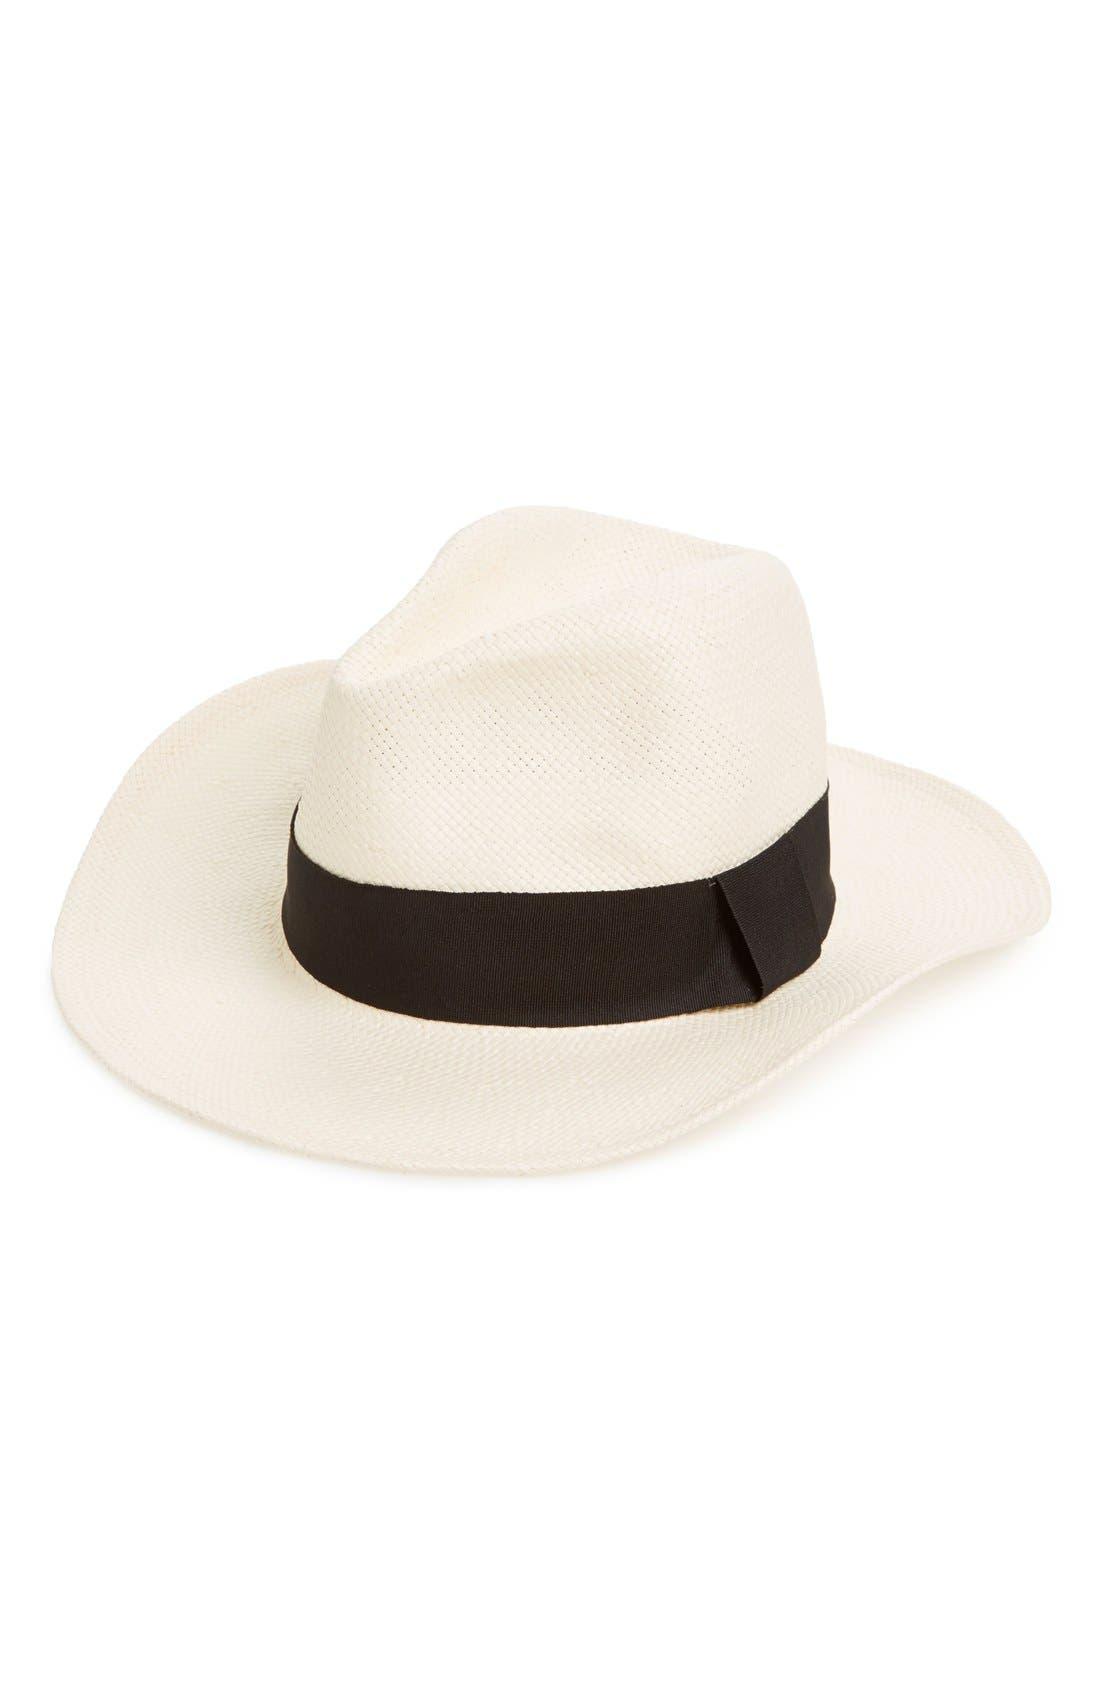 Alternate Image 1 Selected - Michael Stars 'Well Weathered' Straw Panama Hat